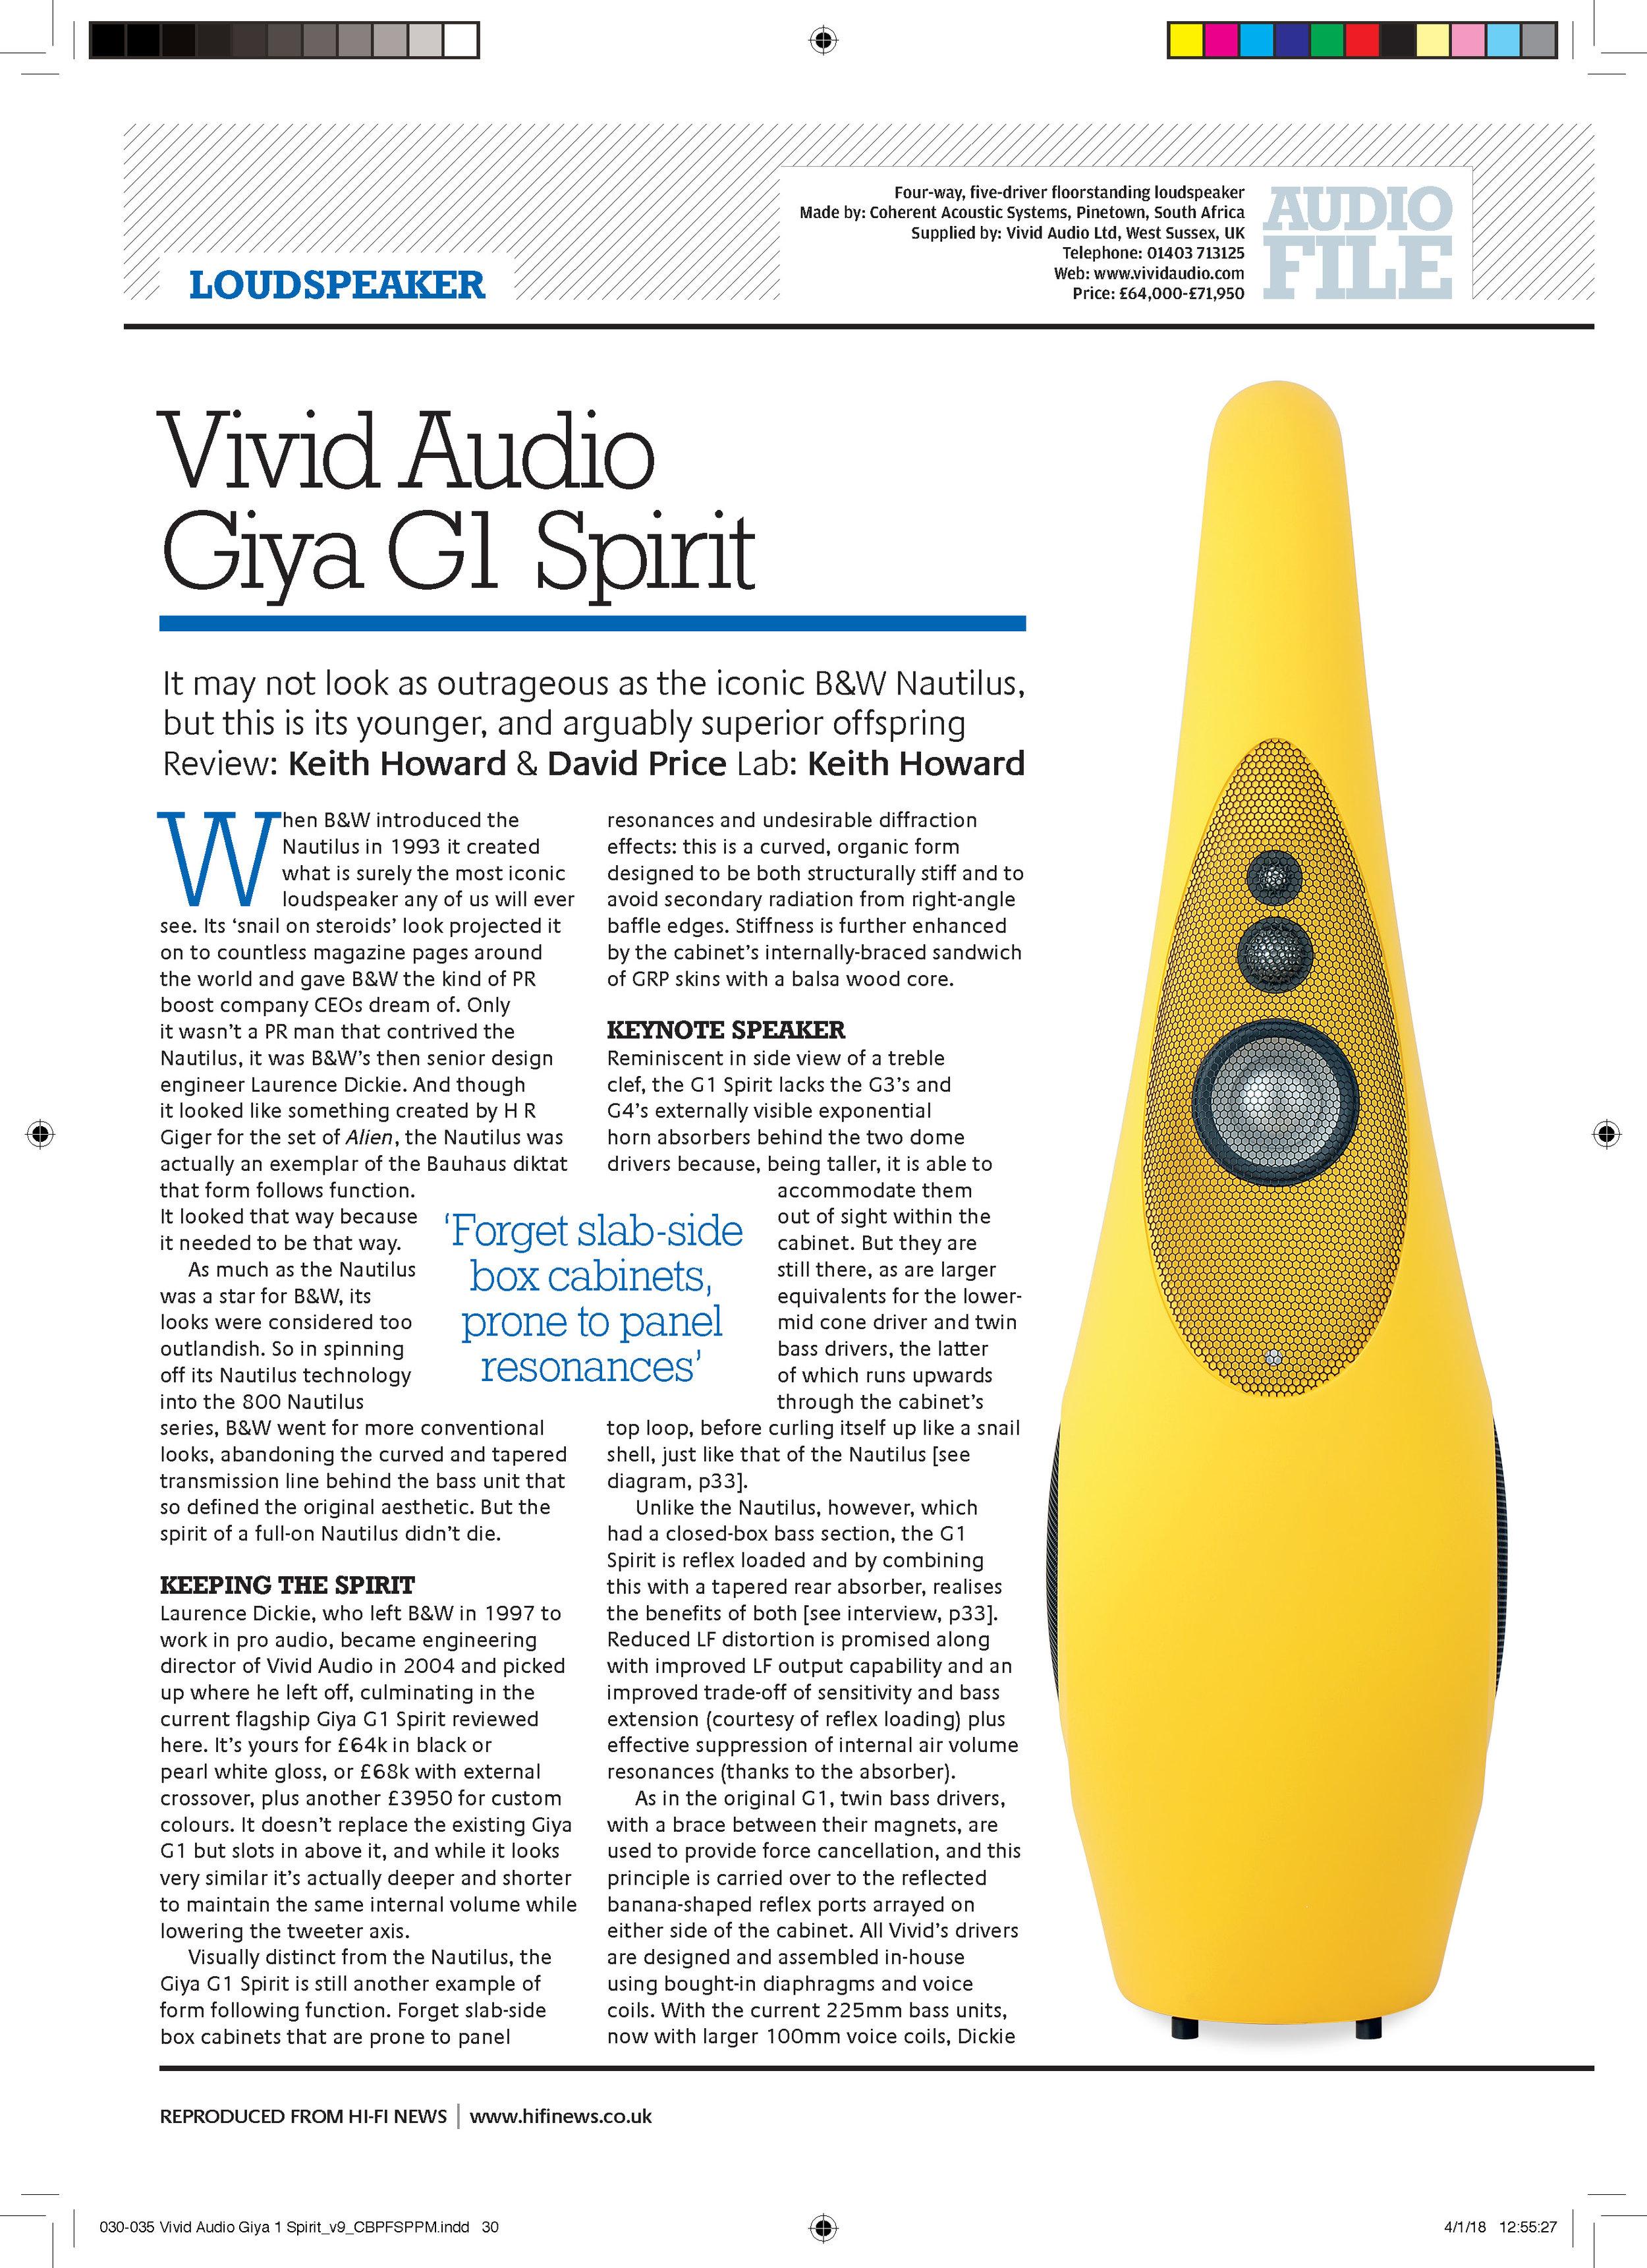 HFN_Vivid Audio Giya G1 Spirit_hires_Page_2.jpg